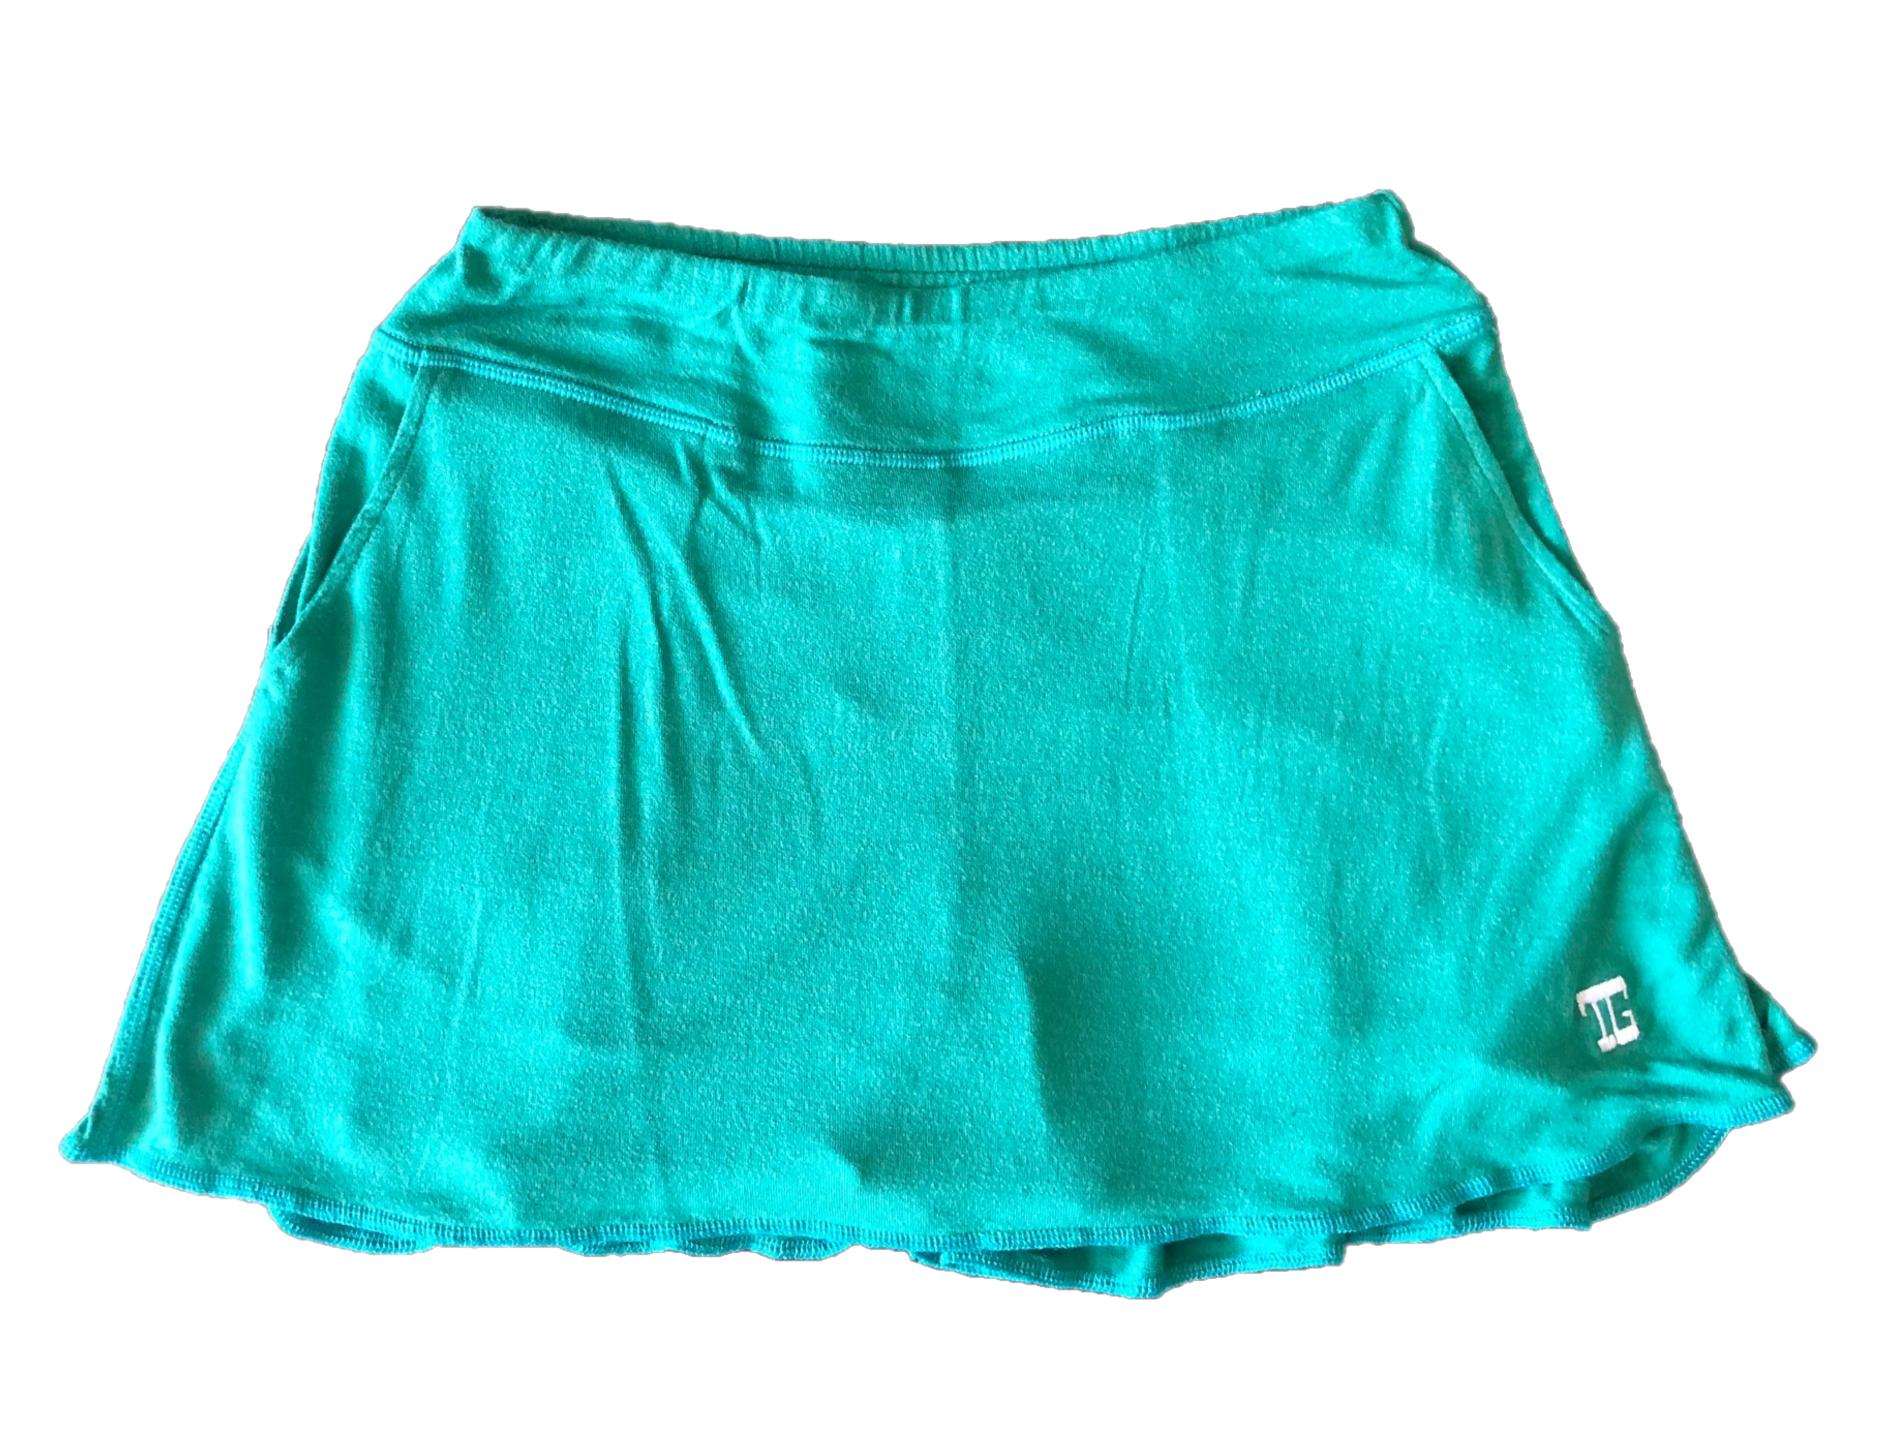 LS-042F    Skirt Green With Rear Swing Pleat Panel 2 Side Pockets & Light Green Overlock Trim